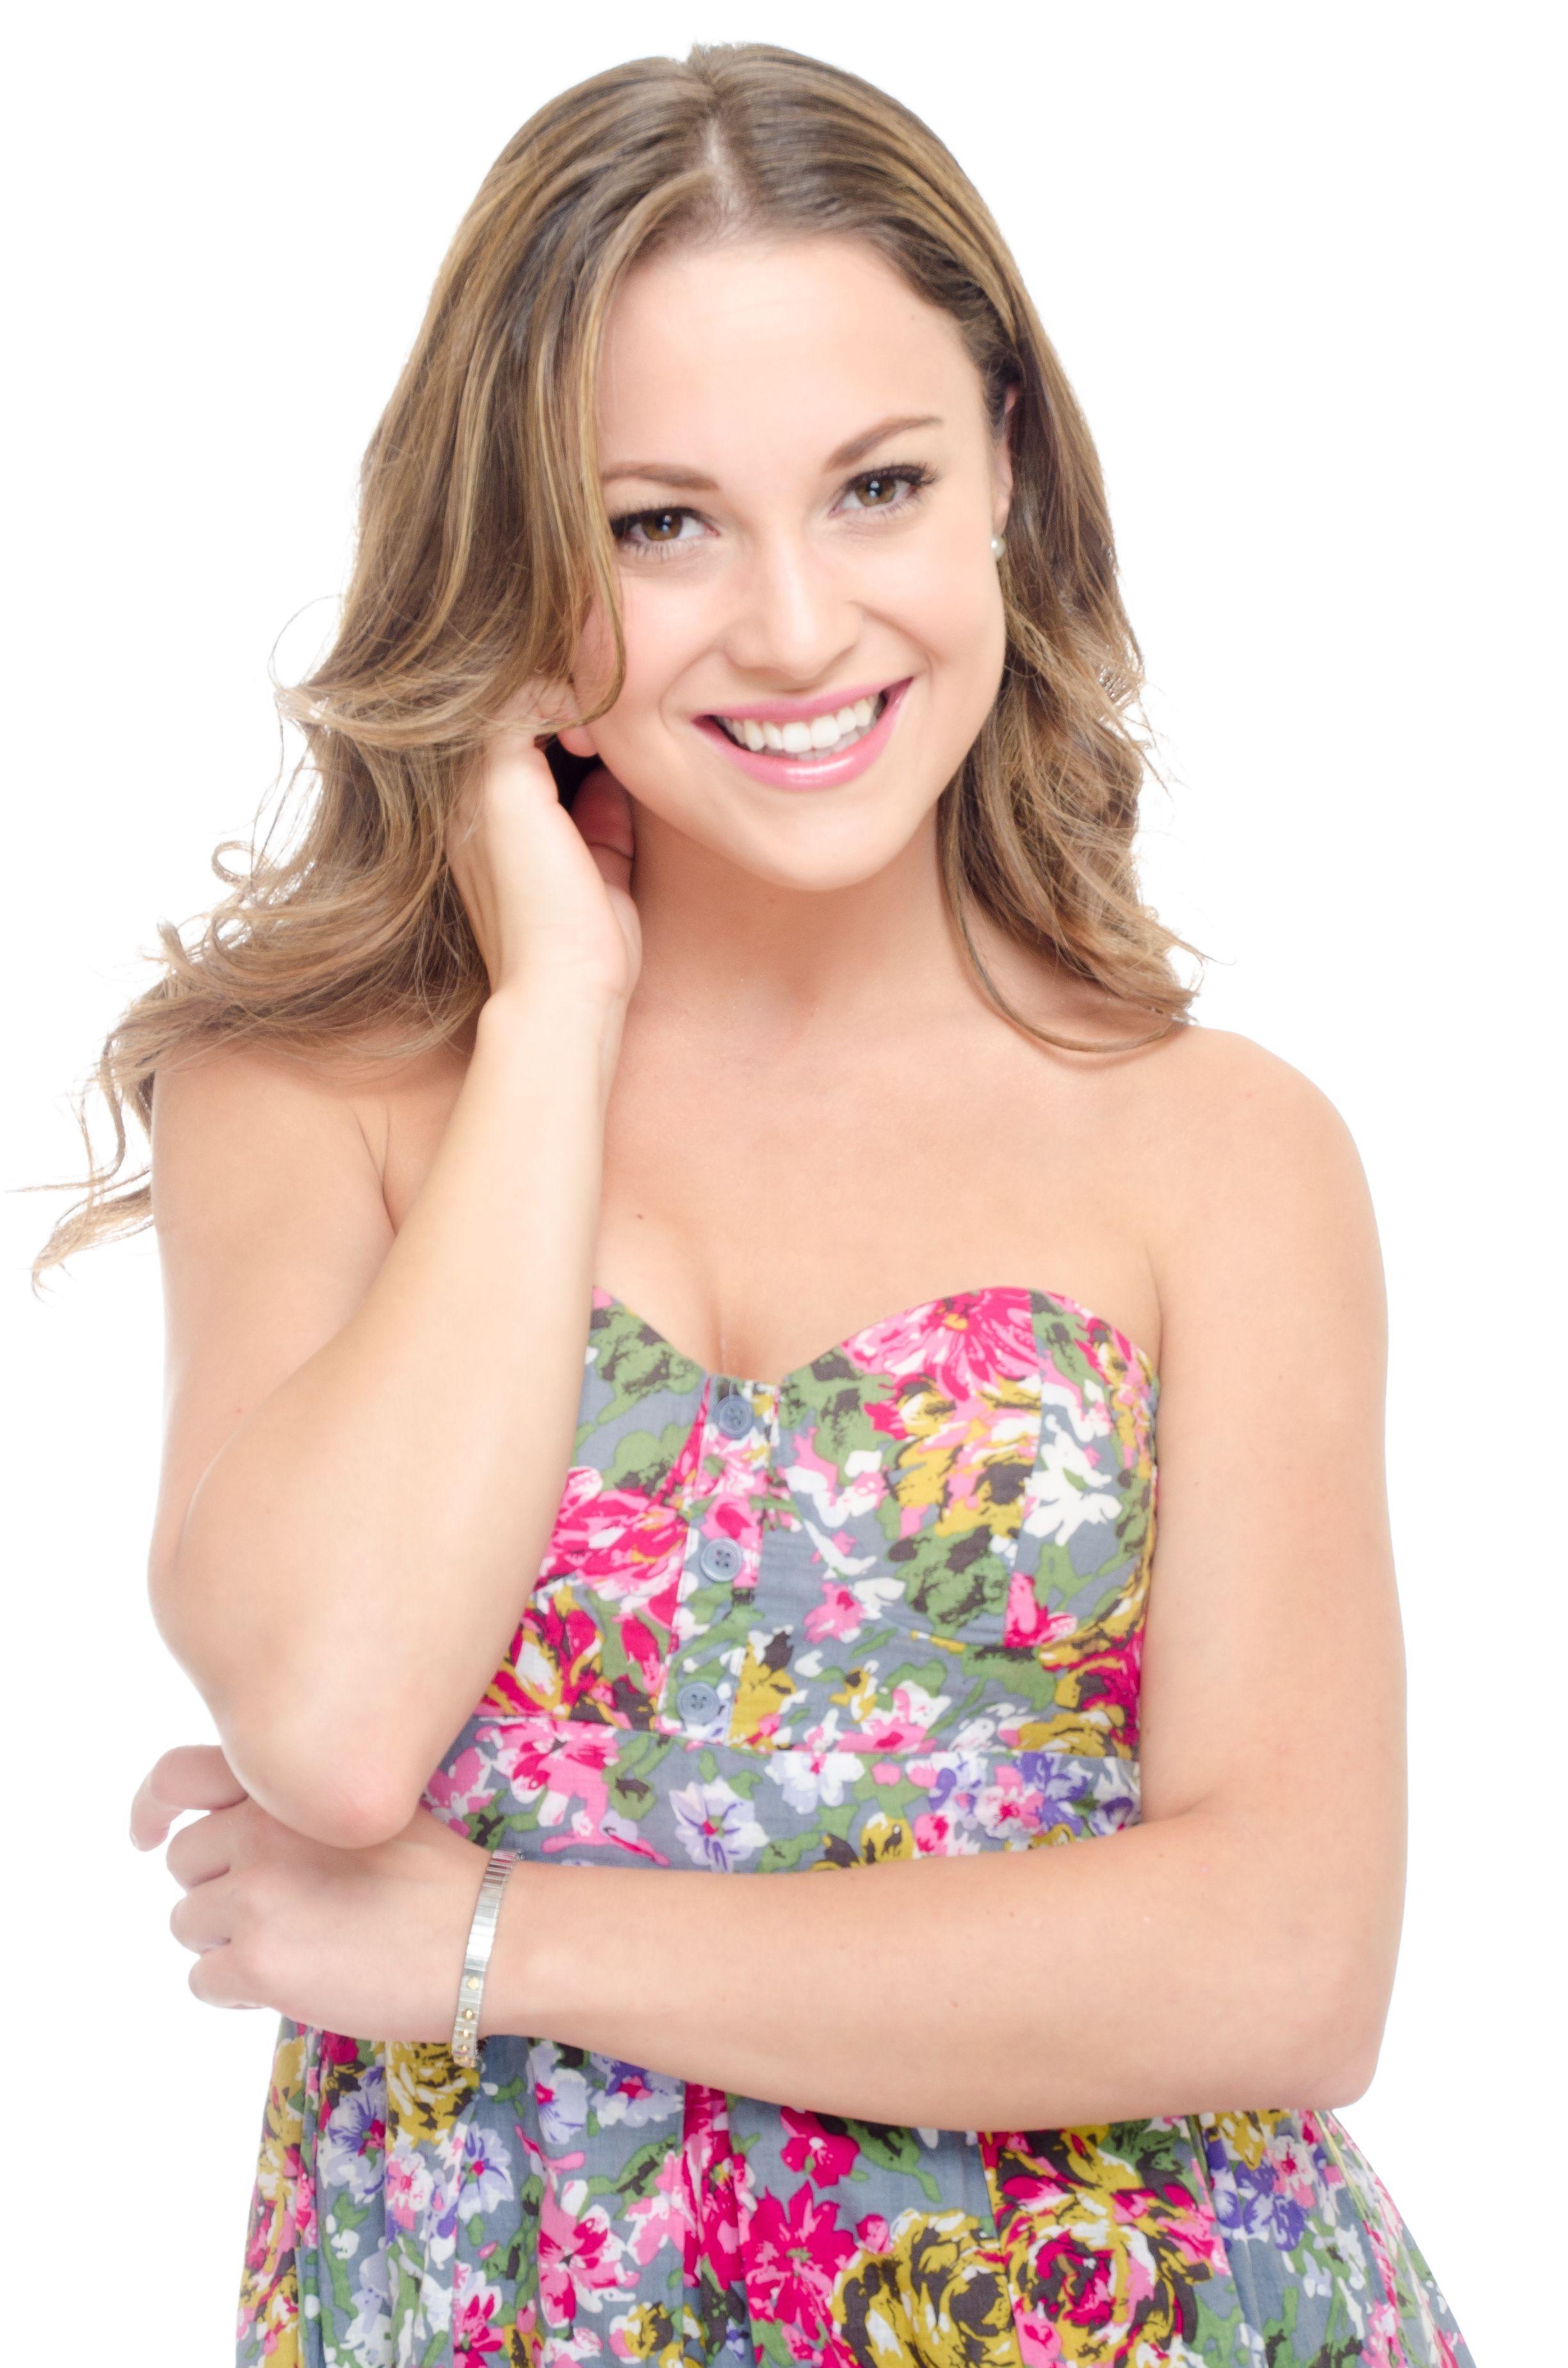 Liggia Nuestra Belleza Latina tv show   Fashion tv ...